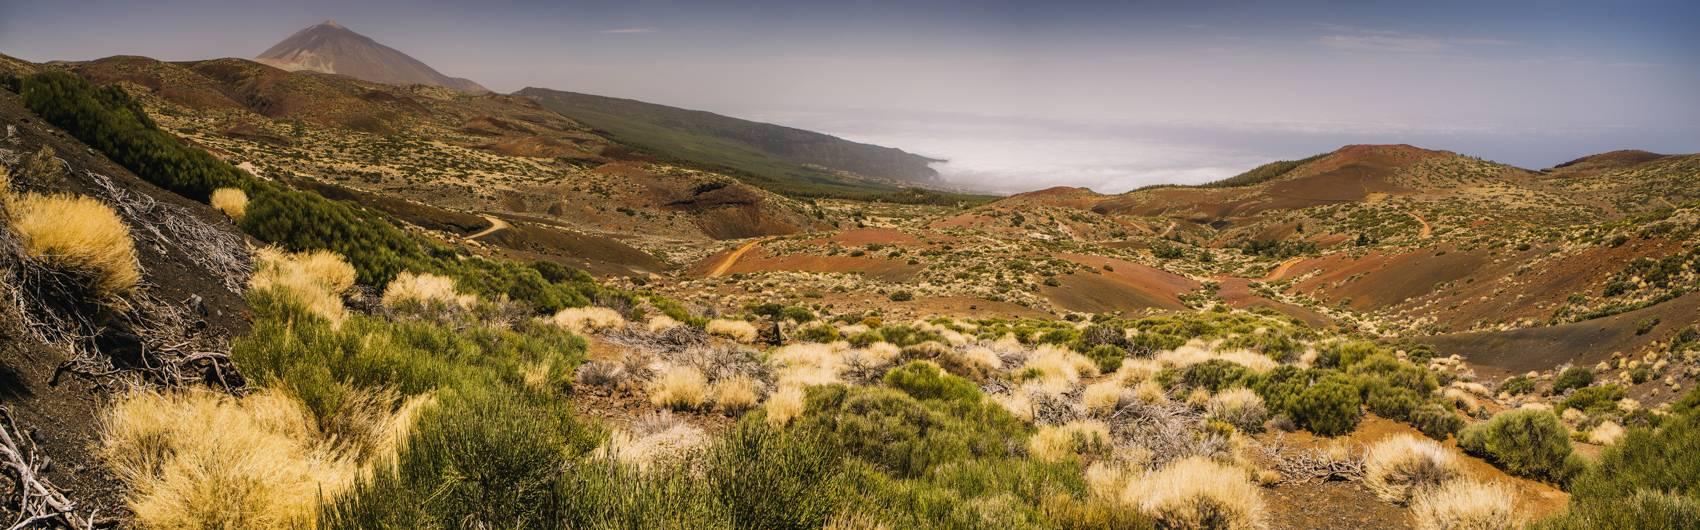 Photo Voyages : Îles Canaries #30